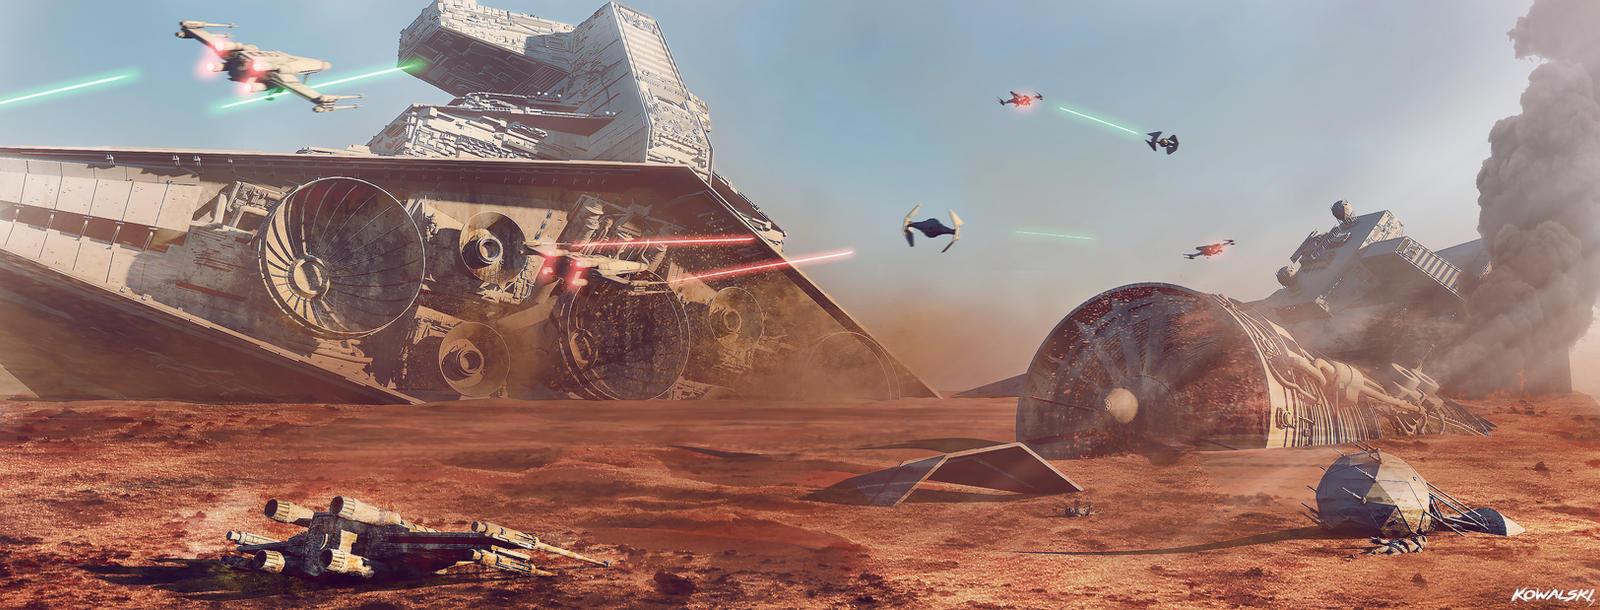 Star Wars Battle of Jakku Concept Art